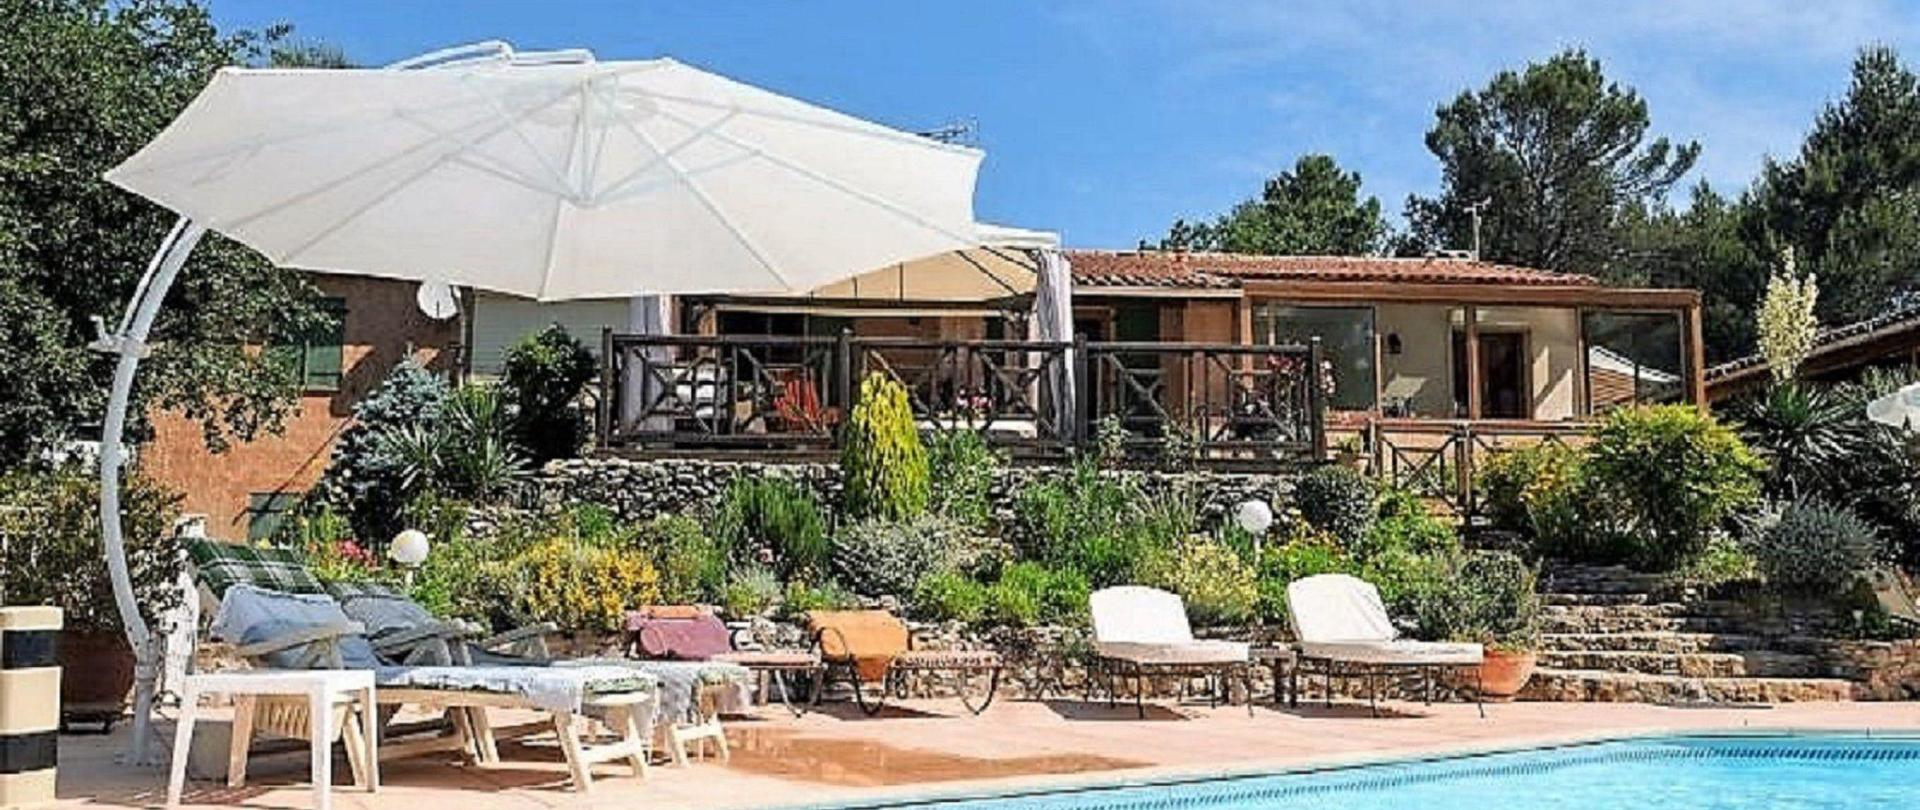 villa-victoria-maison-piscine.jpg